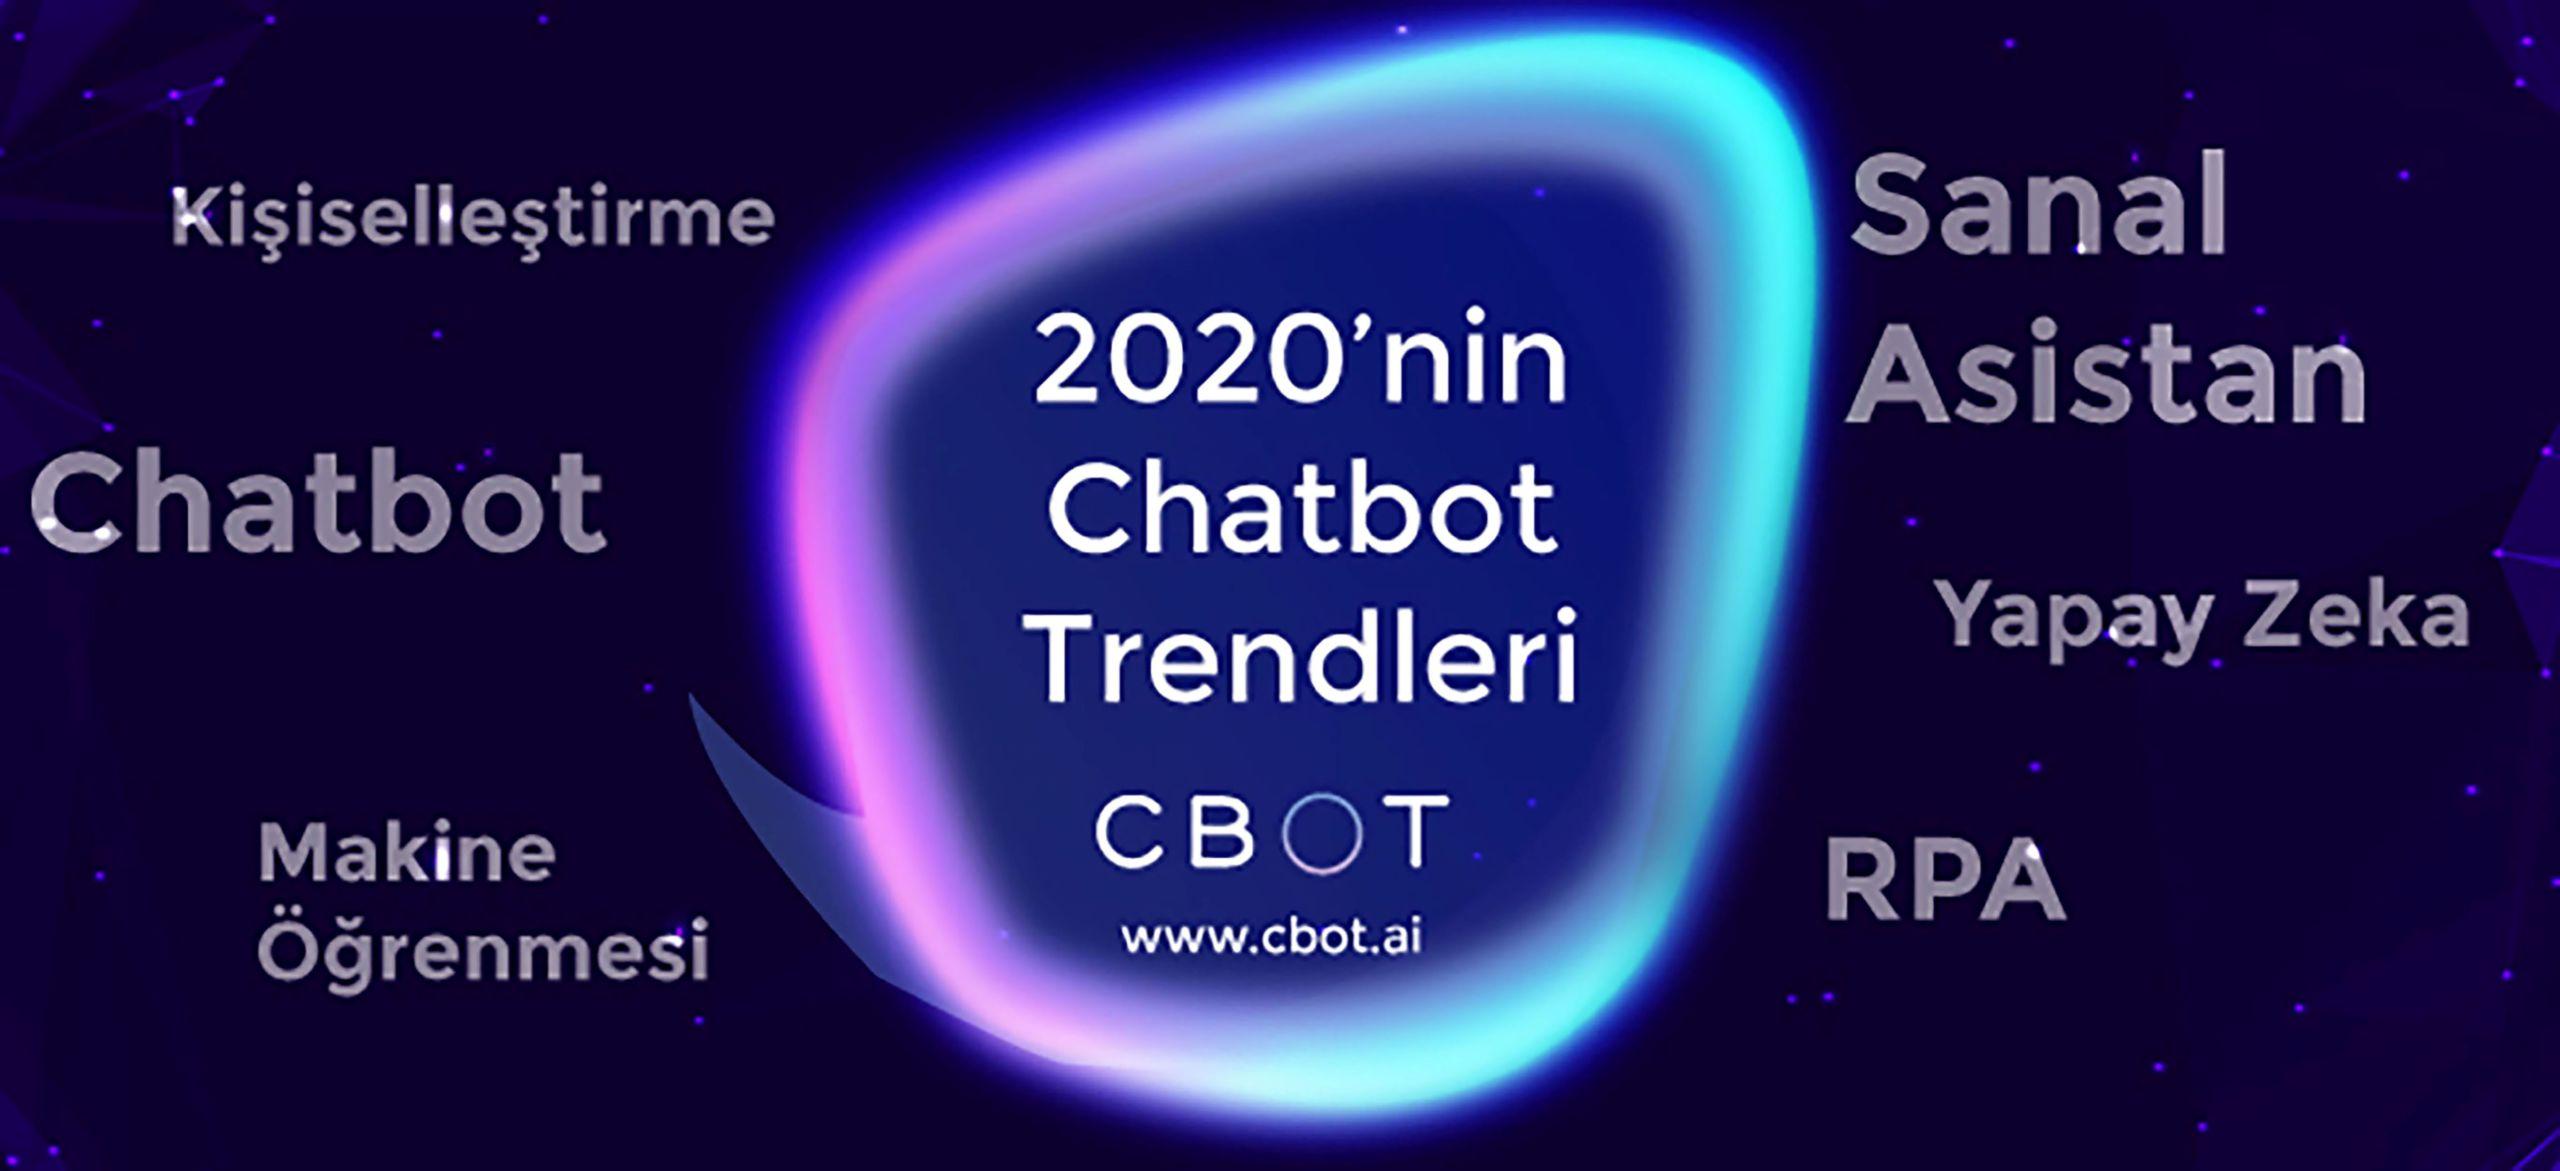 yapay zeka tabanlı Chatbot trendleri